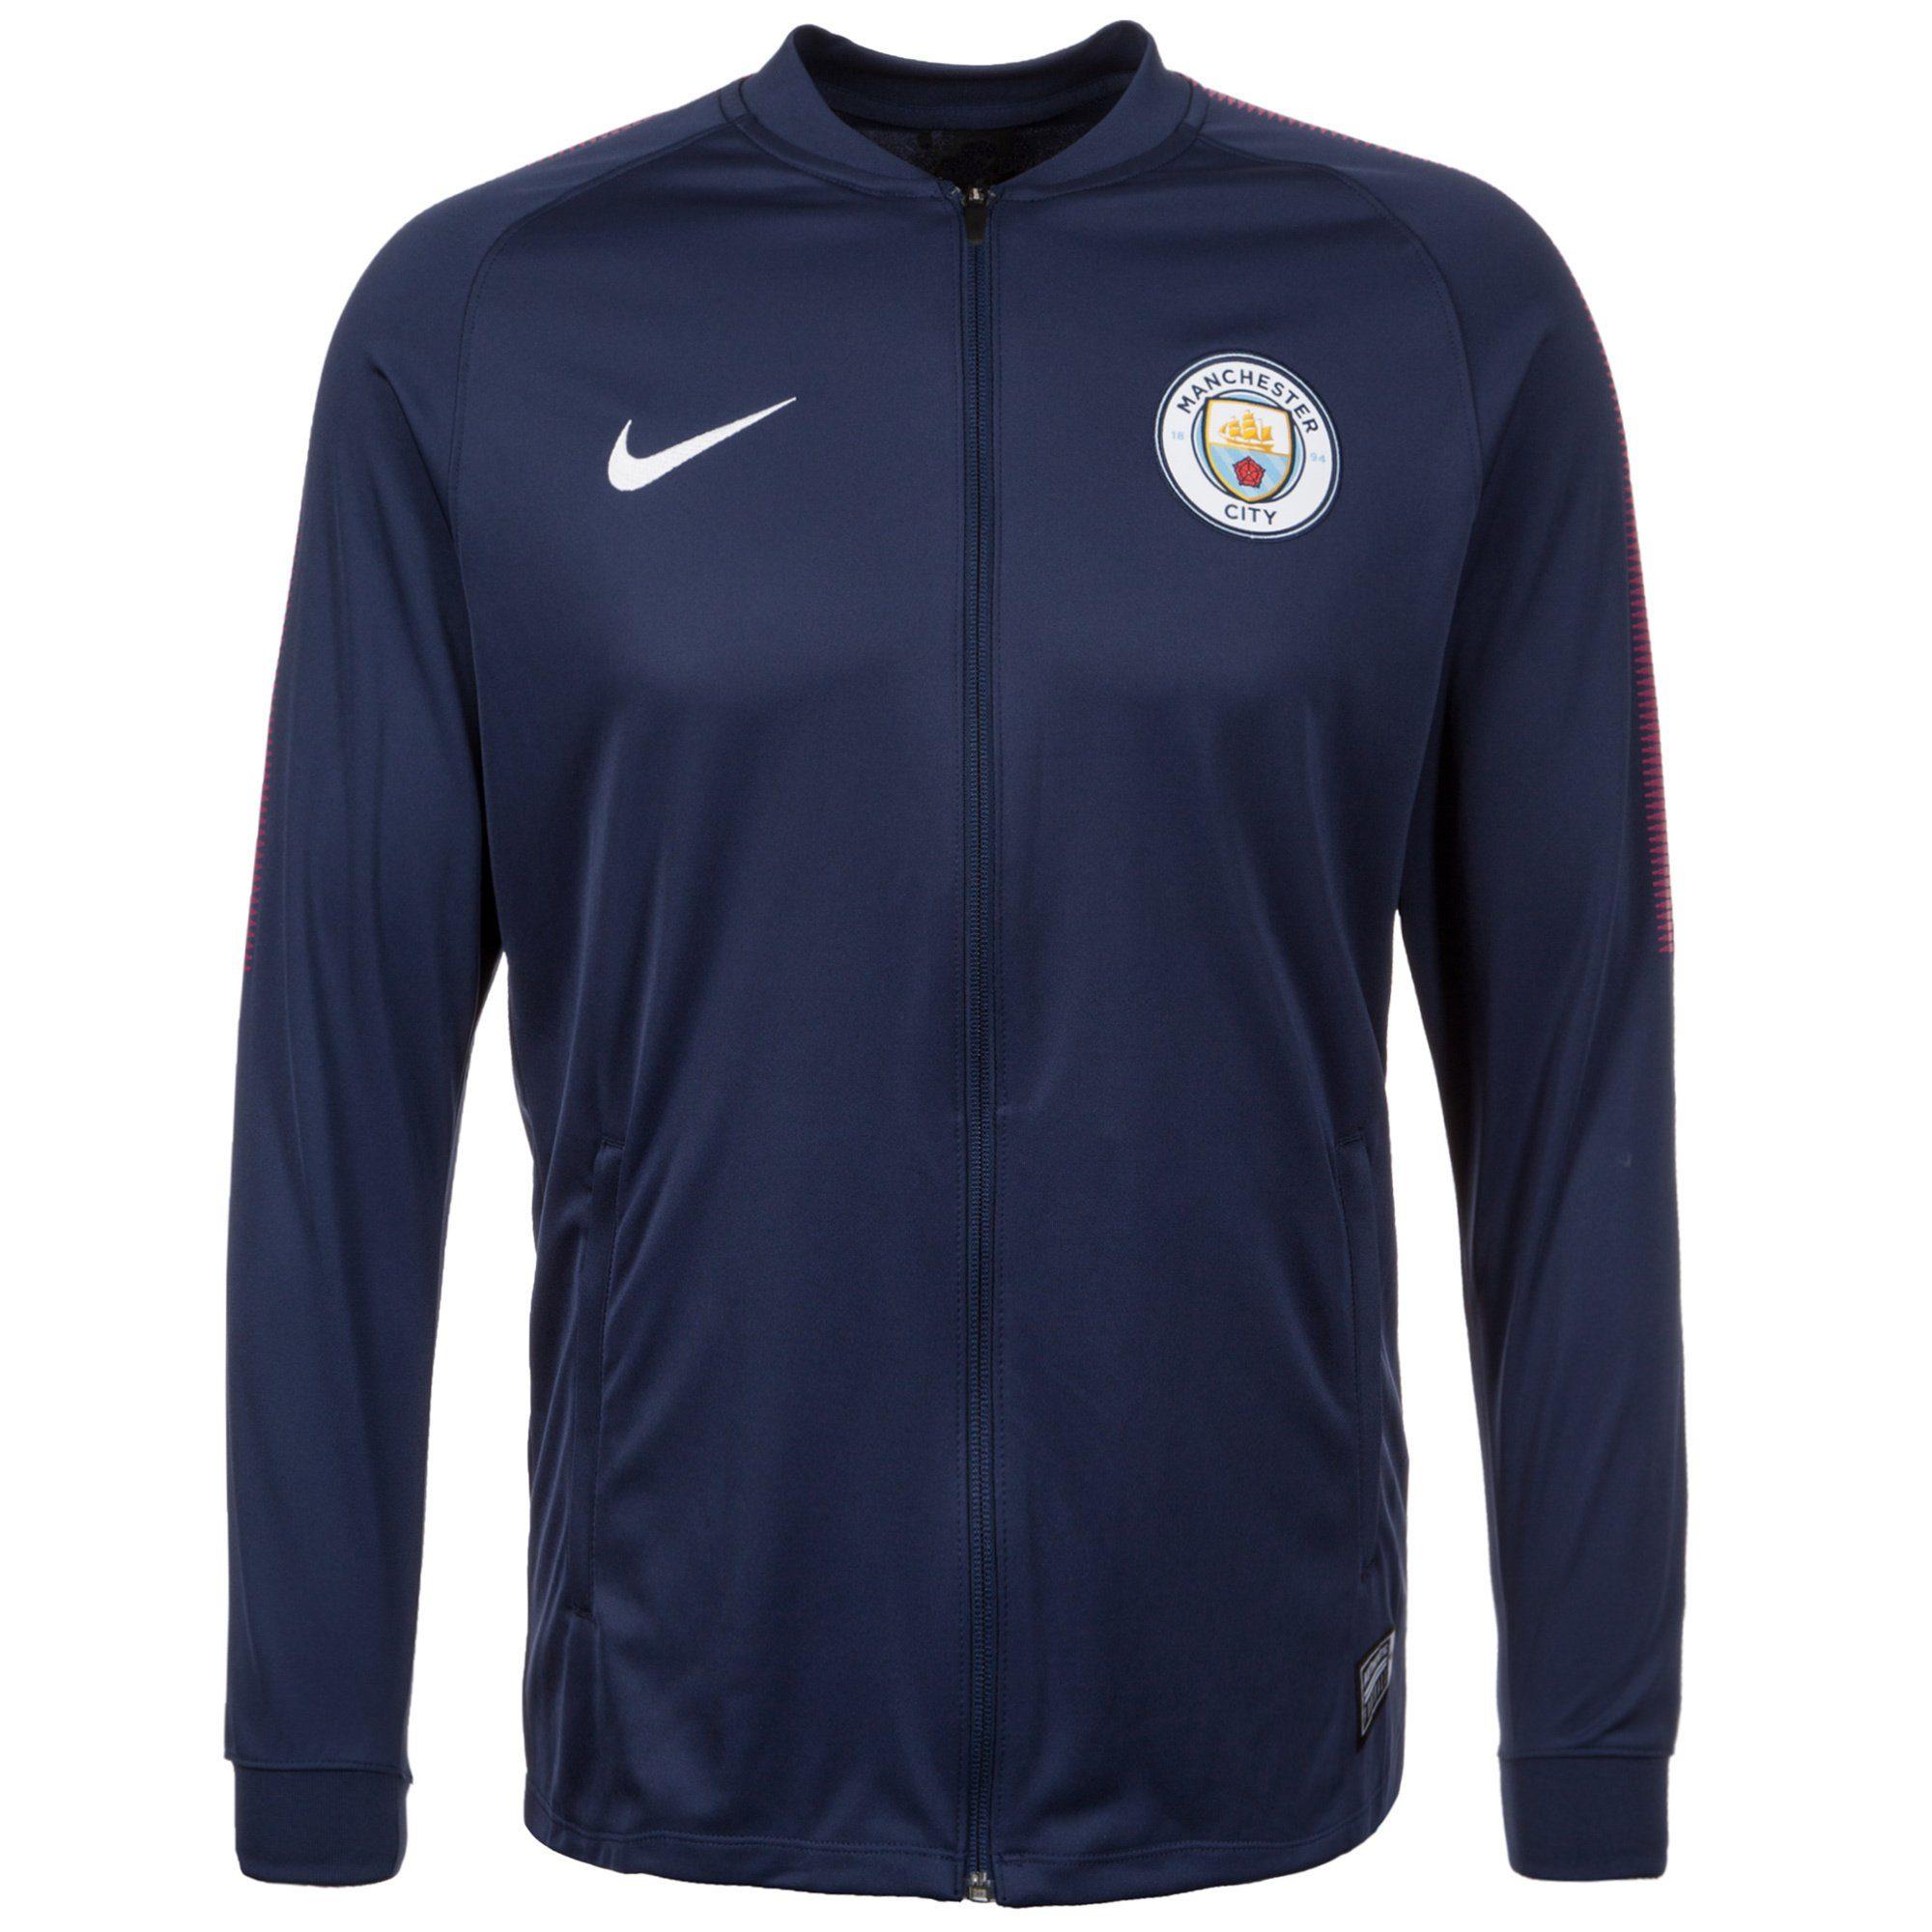 Nike Trainingsjacke Manchester City Dry Squad | Sportbekleidung > Sportjacken > Trainingsjacken | Blau | Nike